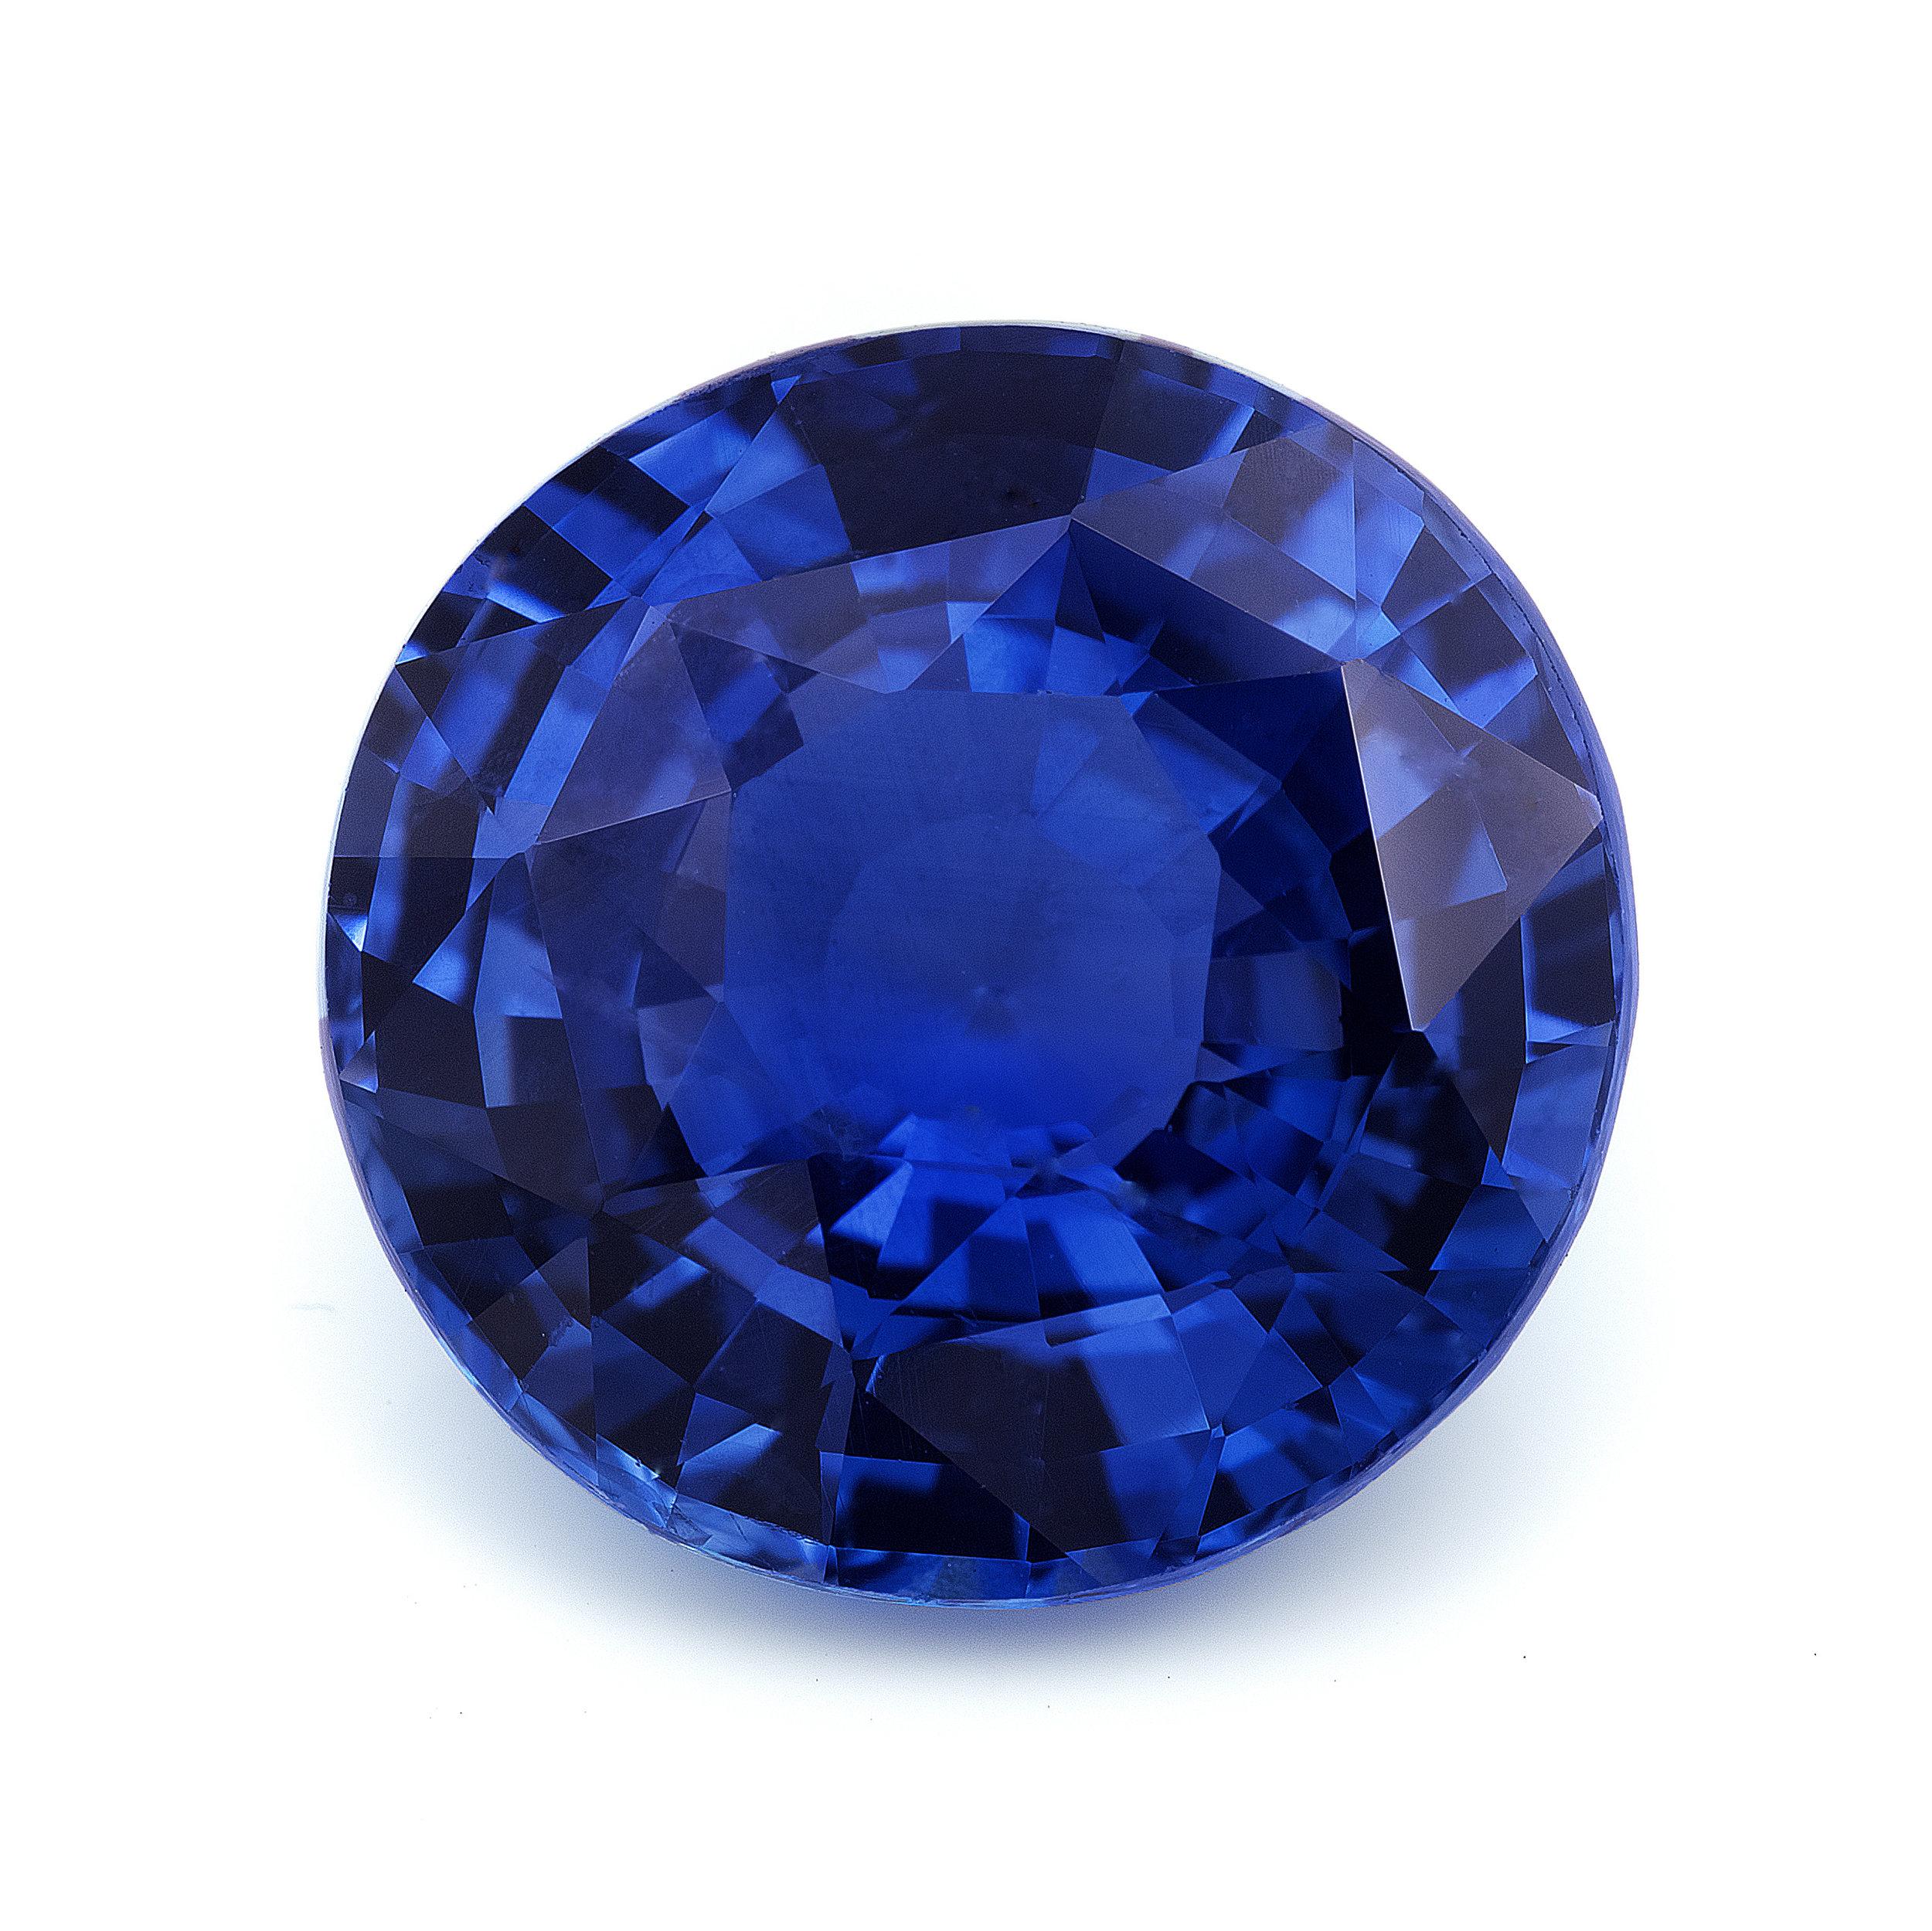 Sapphire - Gem Care